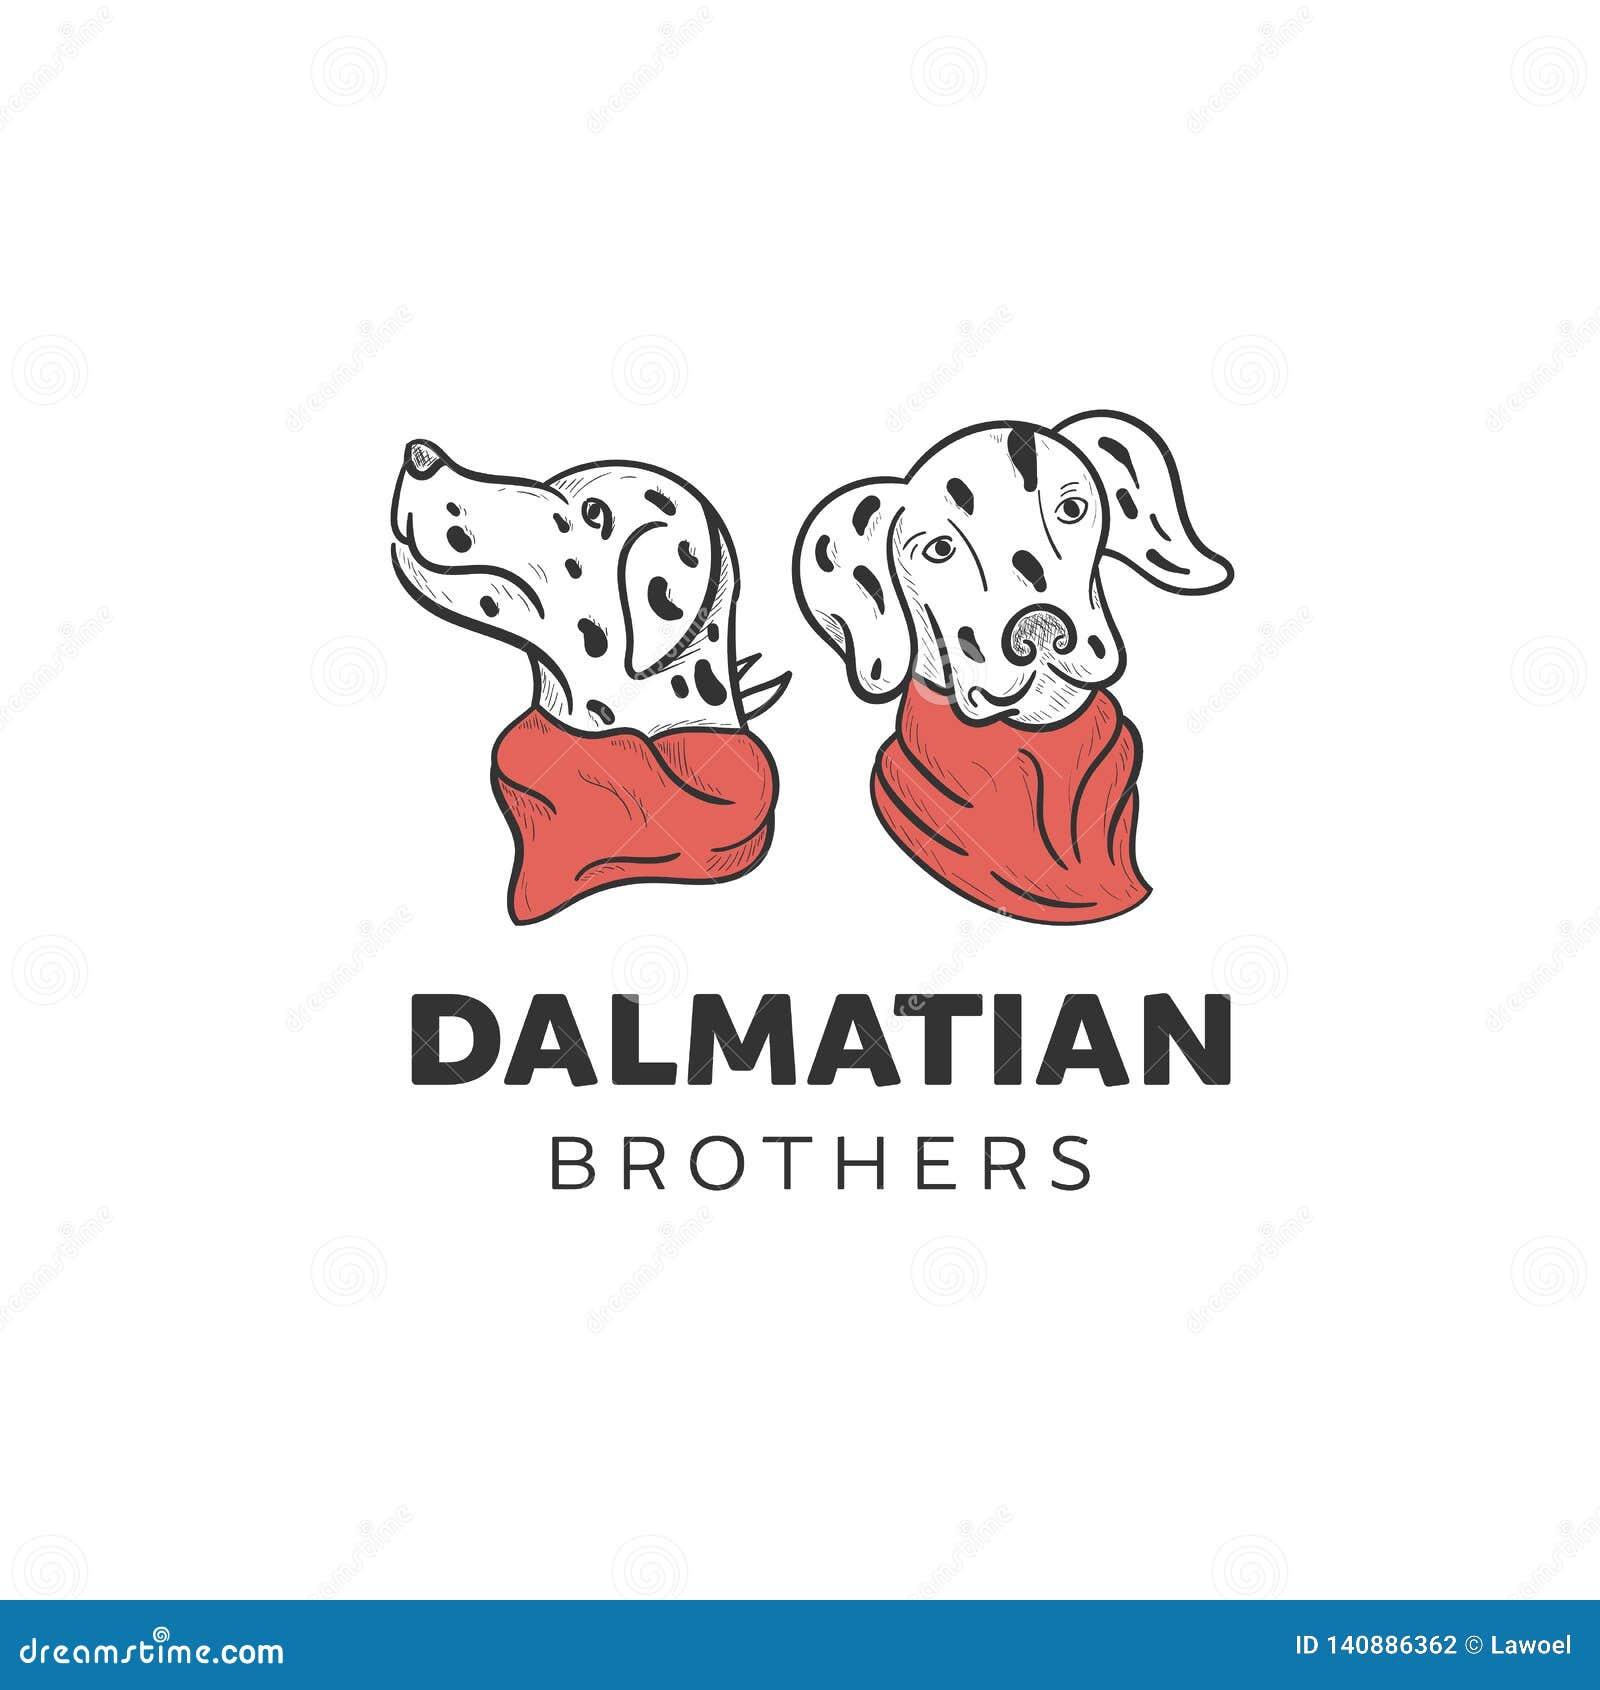 Dalmatian dogs illustration designs